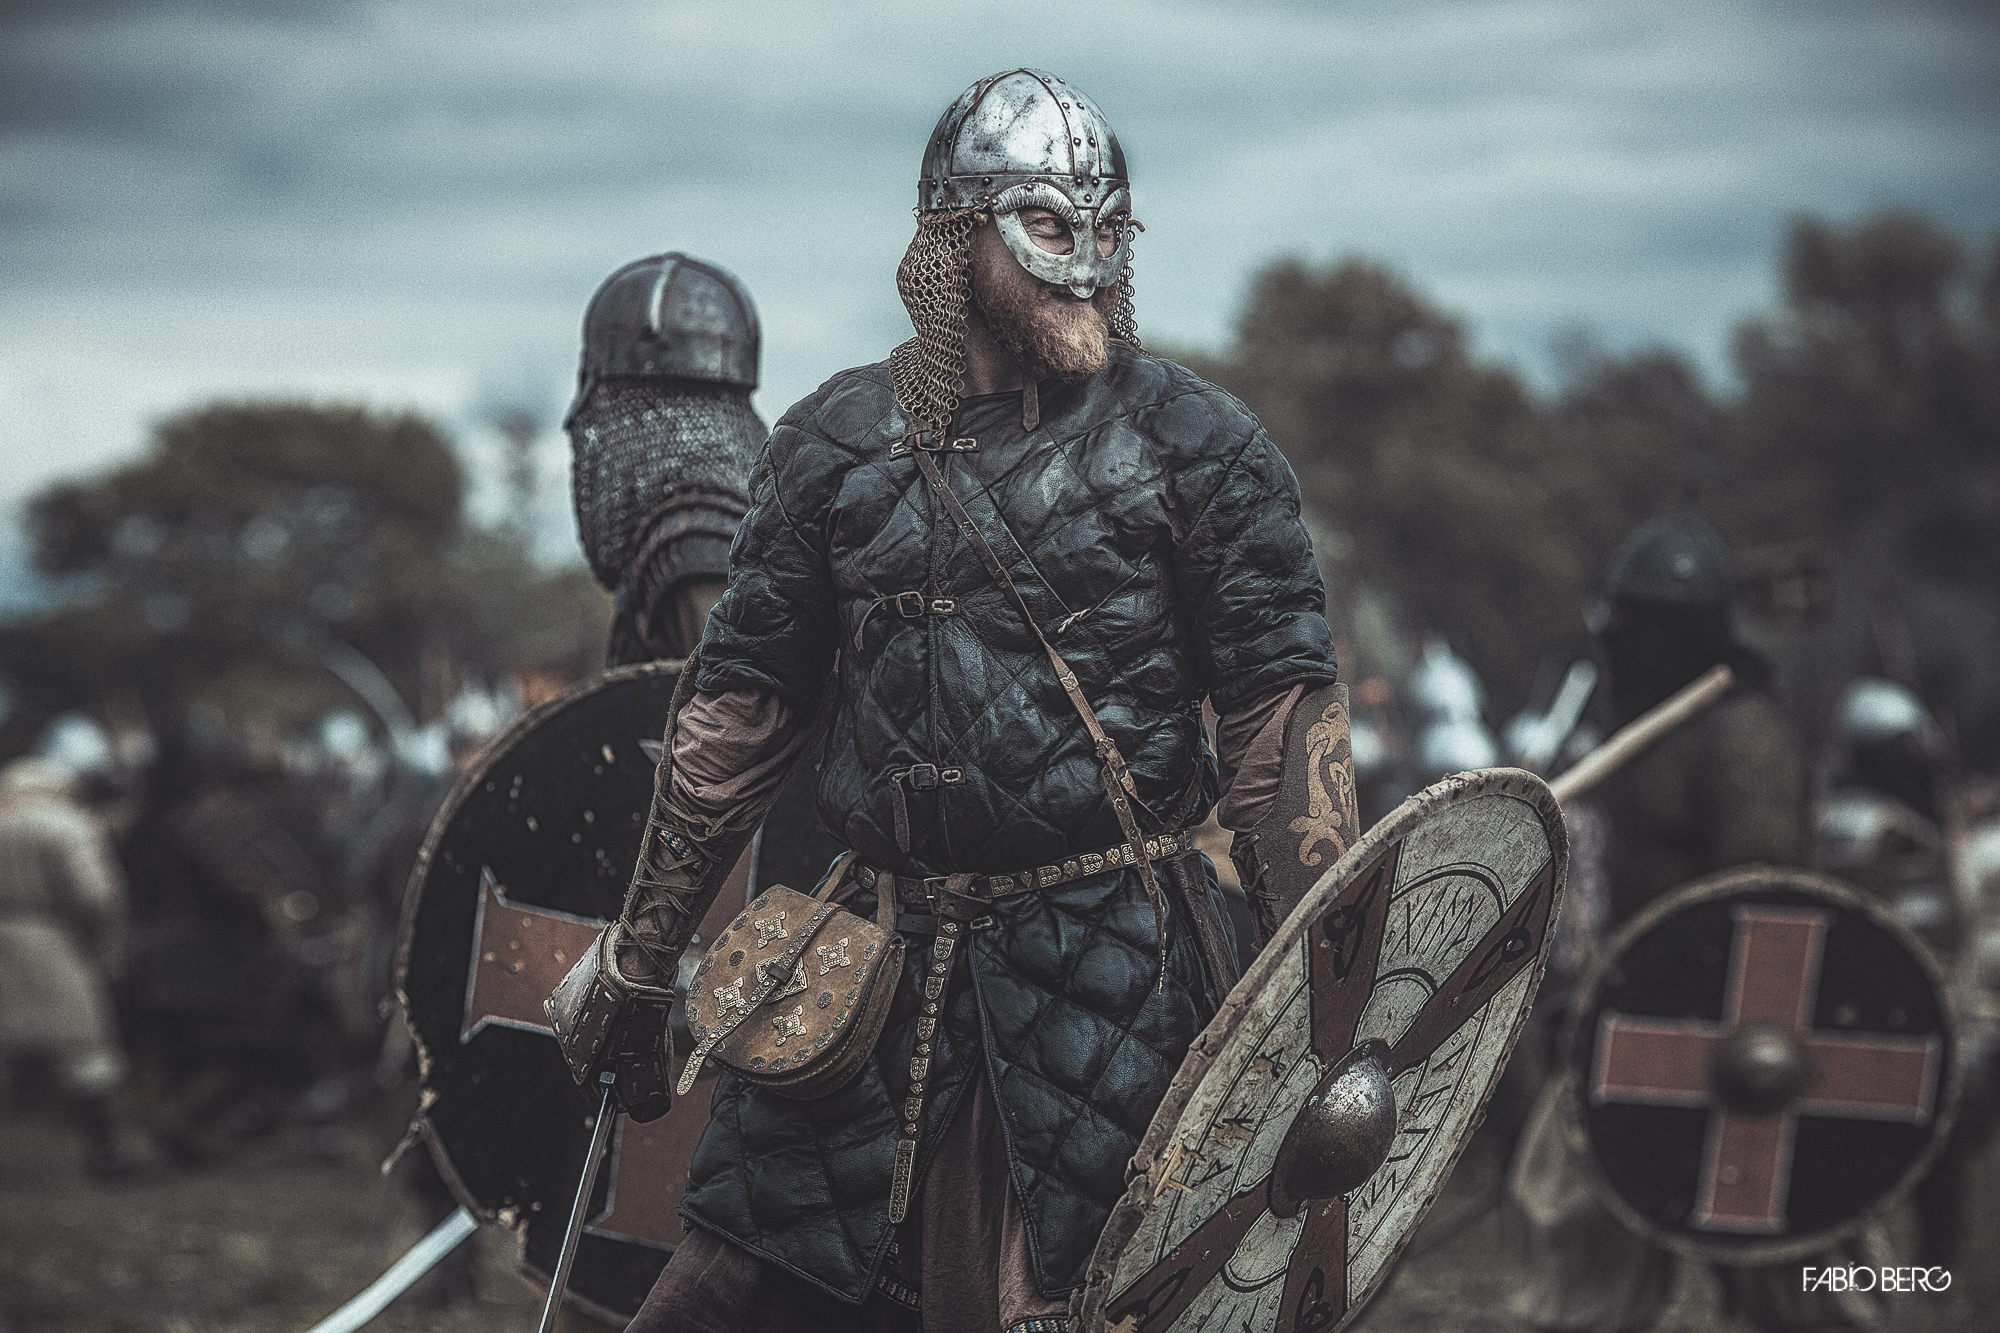 Wolin Viking Festival...